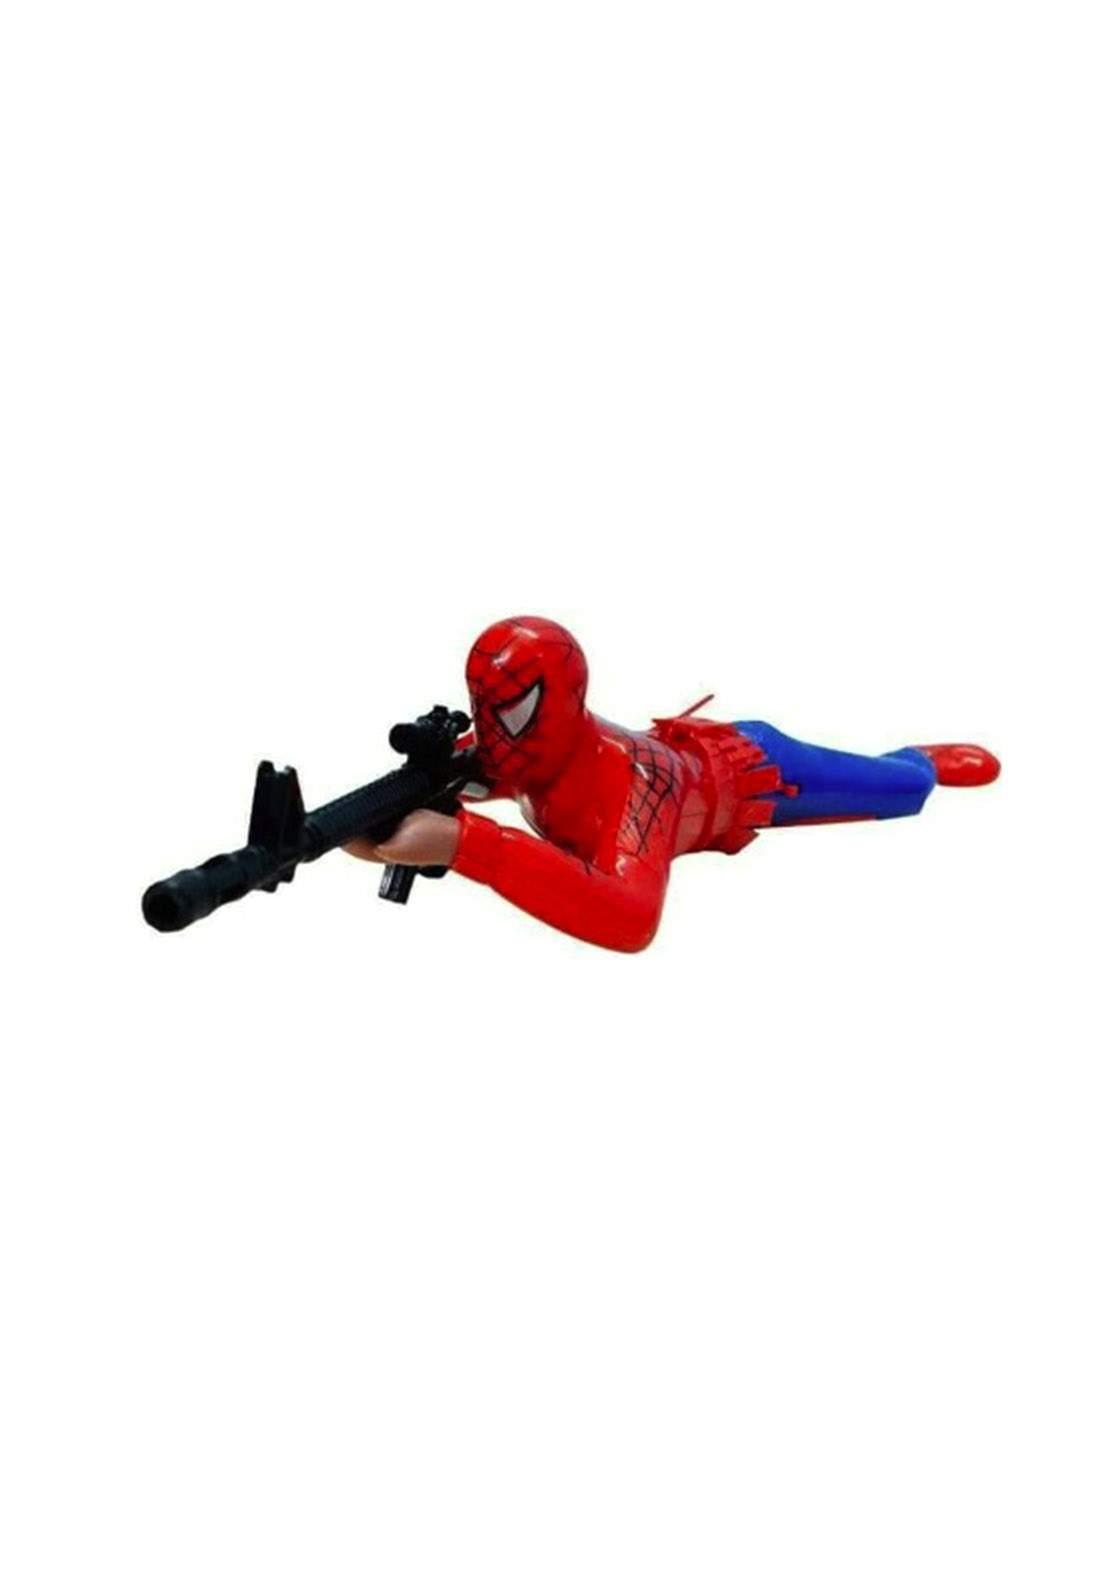 Super Hero 611-1 Electric Flash Crawling Spiderman لعبة الرجل العنكبوت